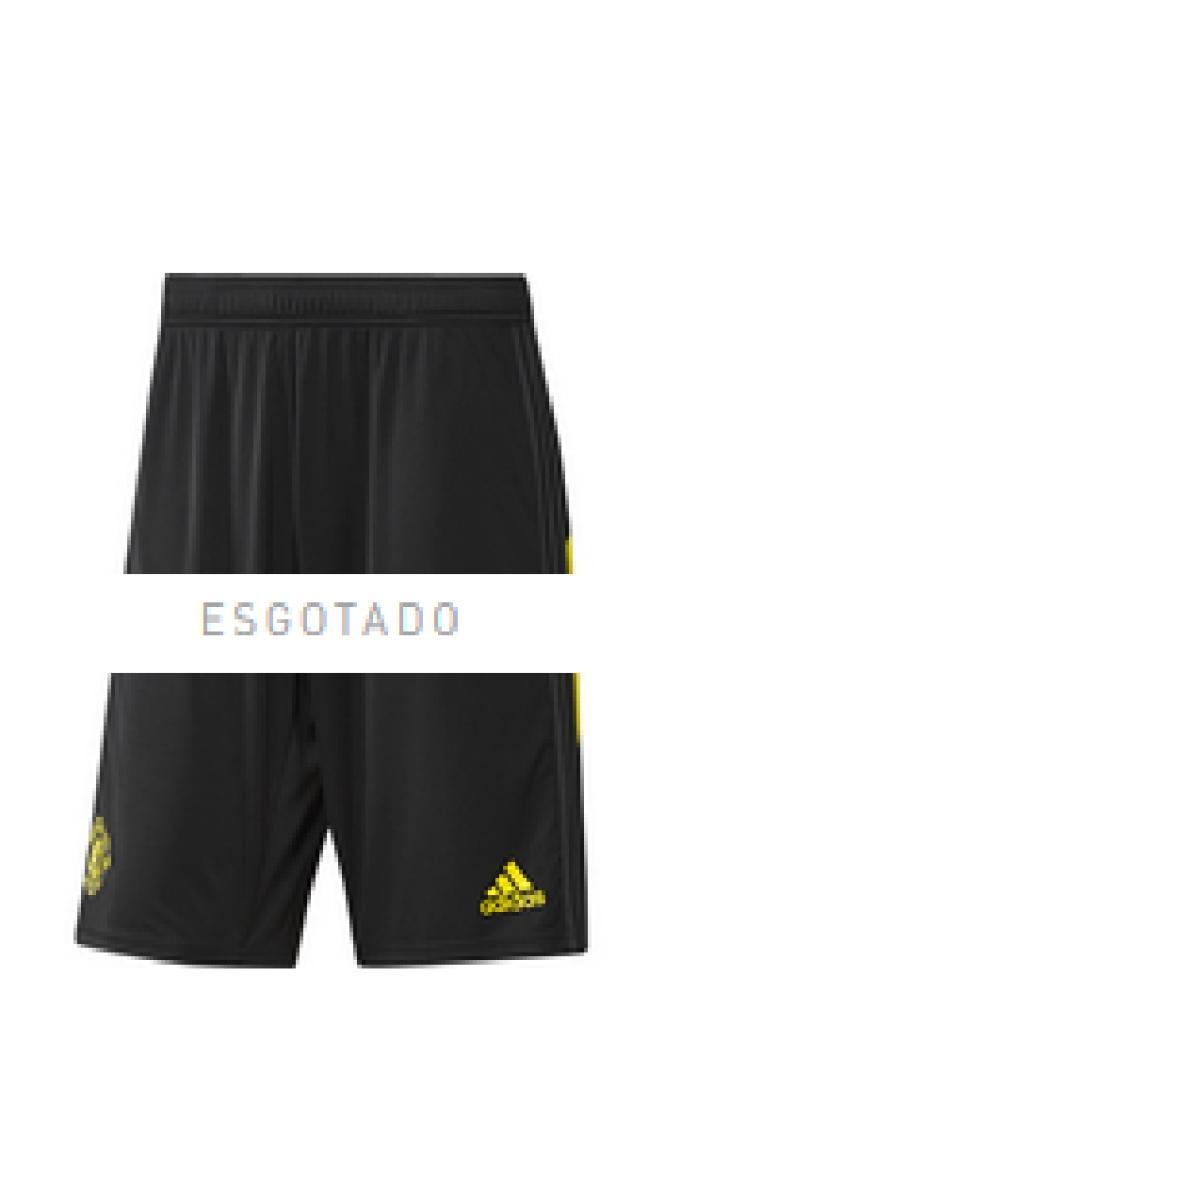 Calçao Masculino Adidas Dx9060 Treino Man Initad Preto